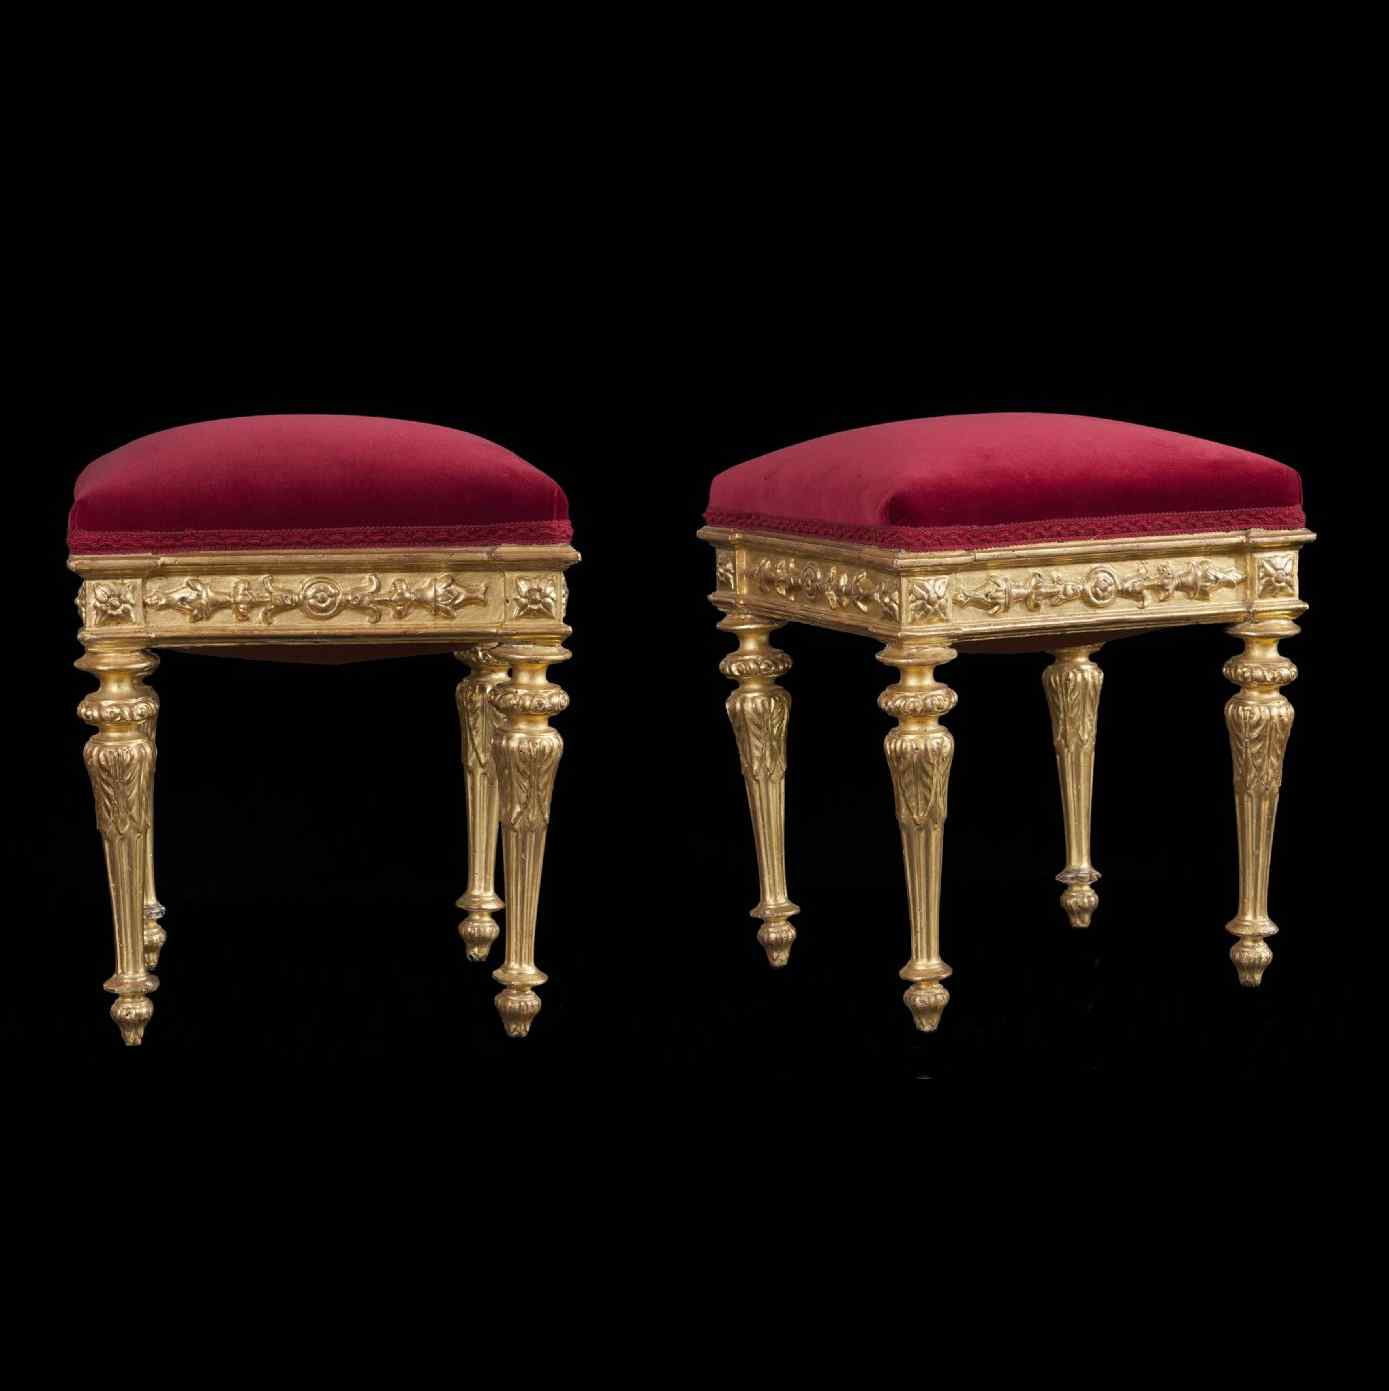 Pair of  18th century italian stools